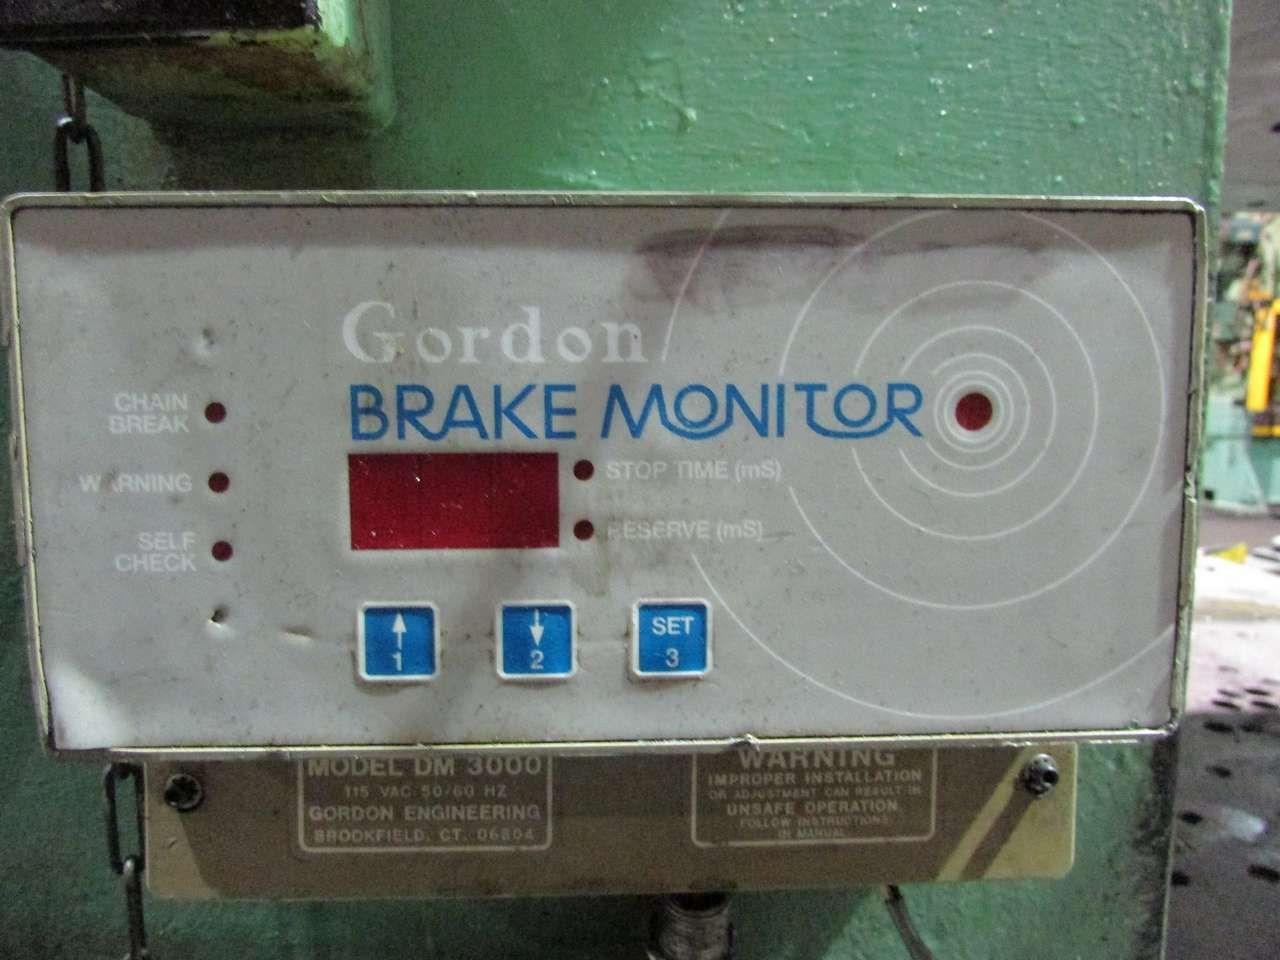 200 ton USI Clearing brake monitor